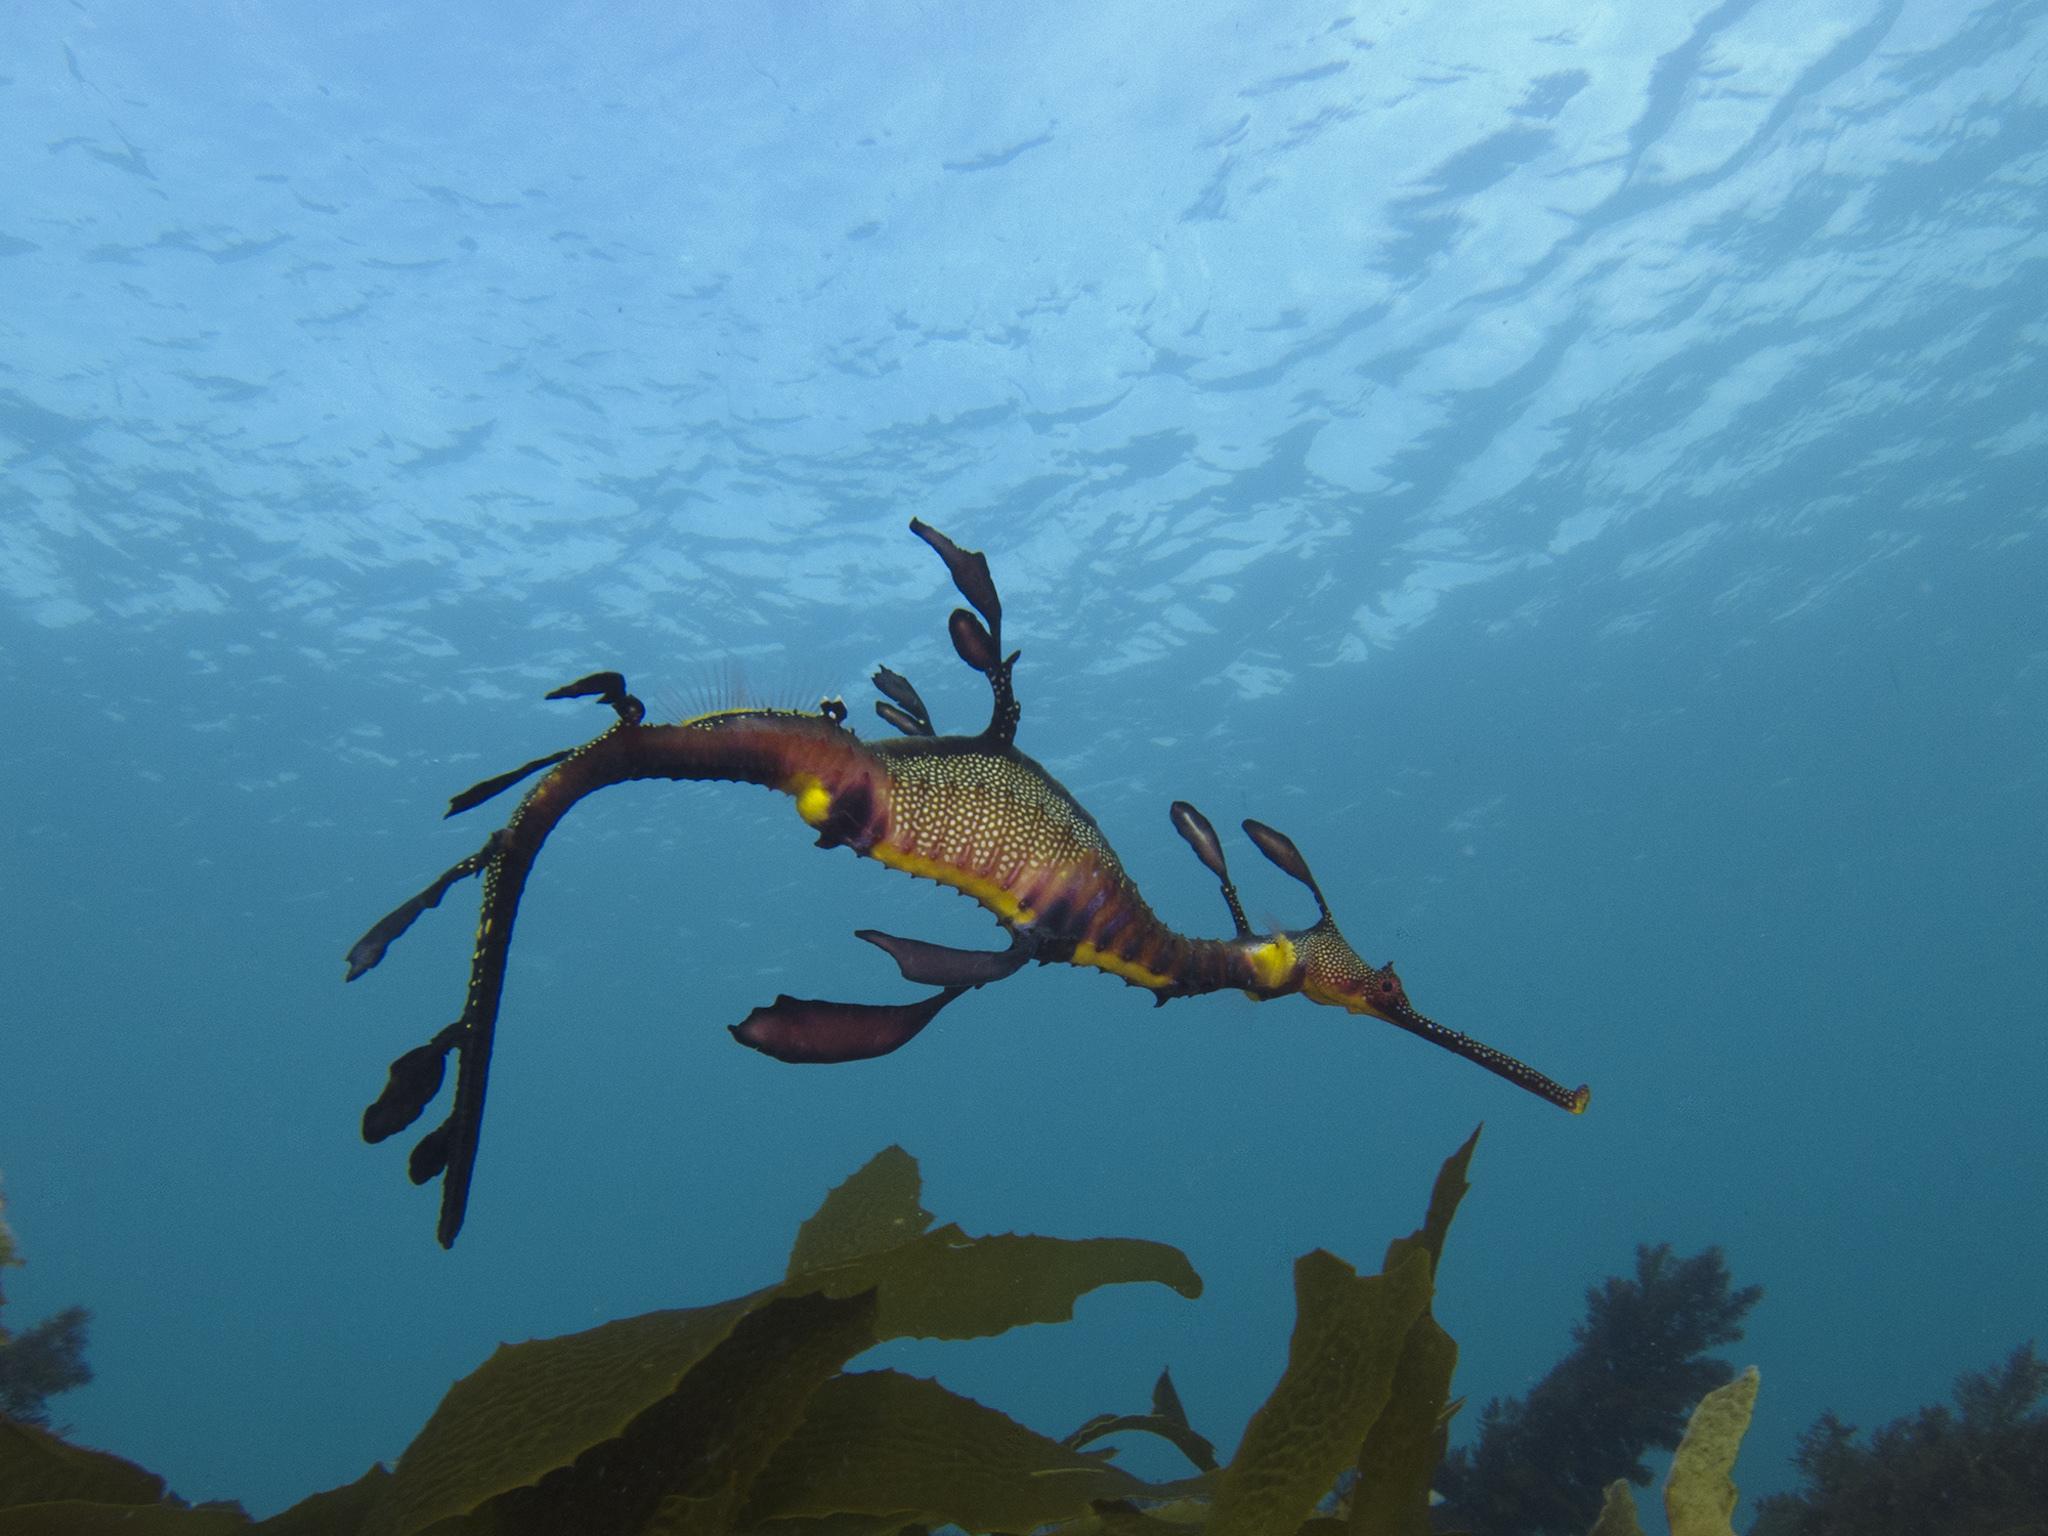 Seadragon's Lair